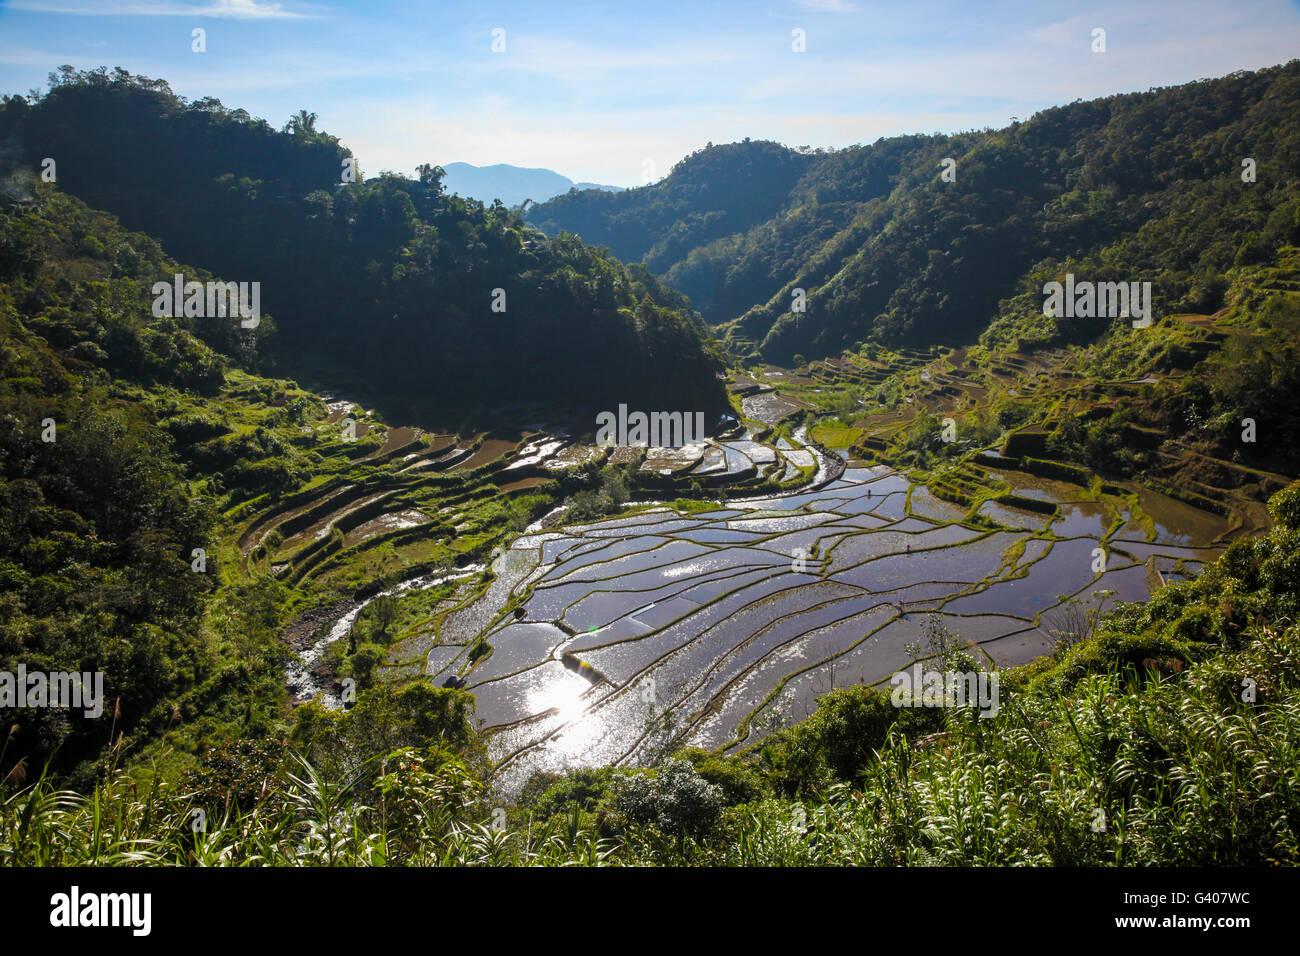 UNESCO rice terraces in Batad, Philippines - Stock Image